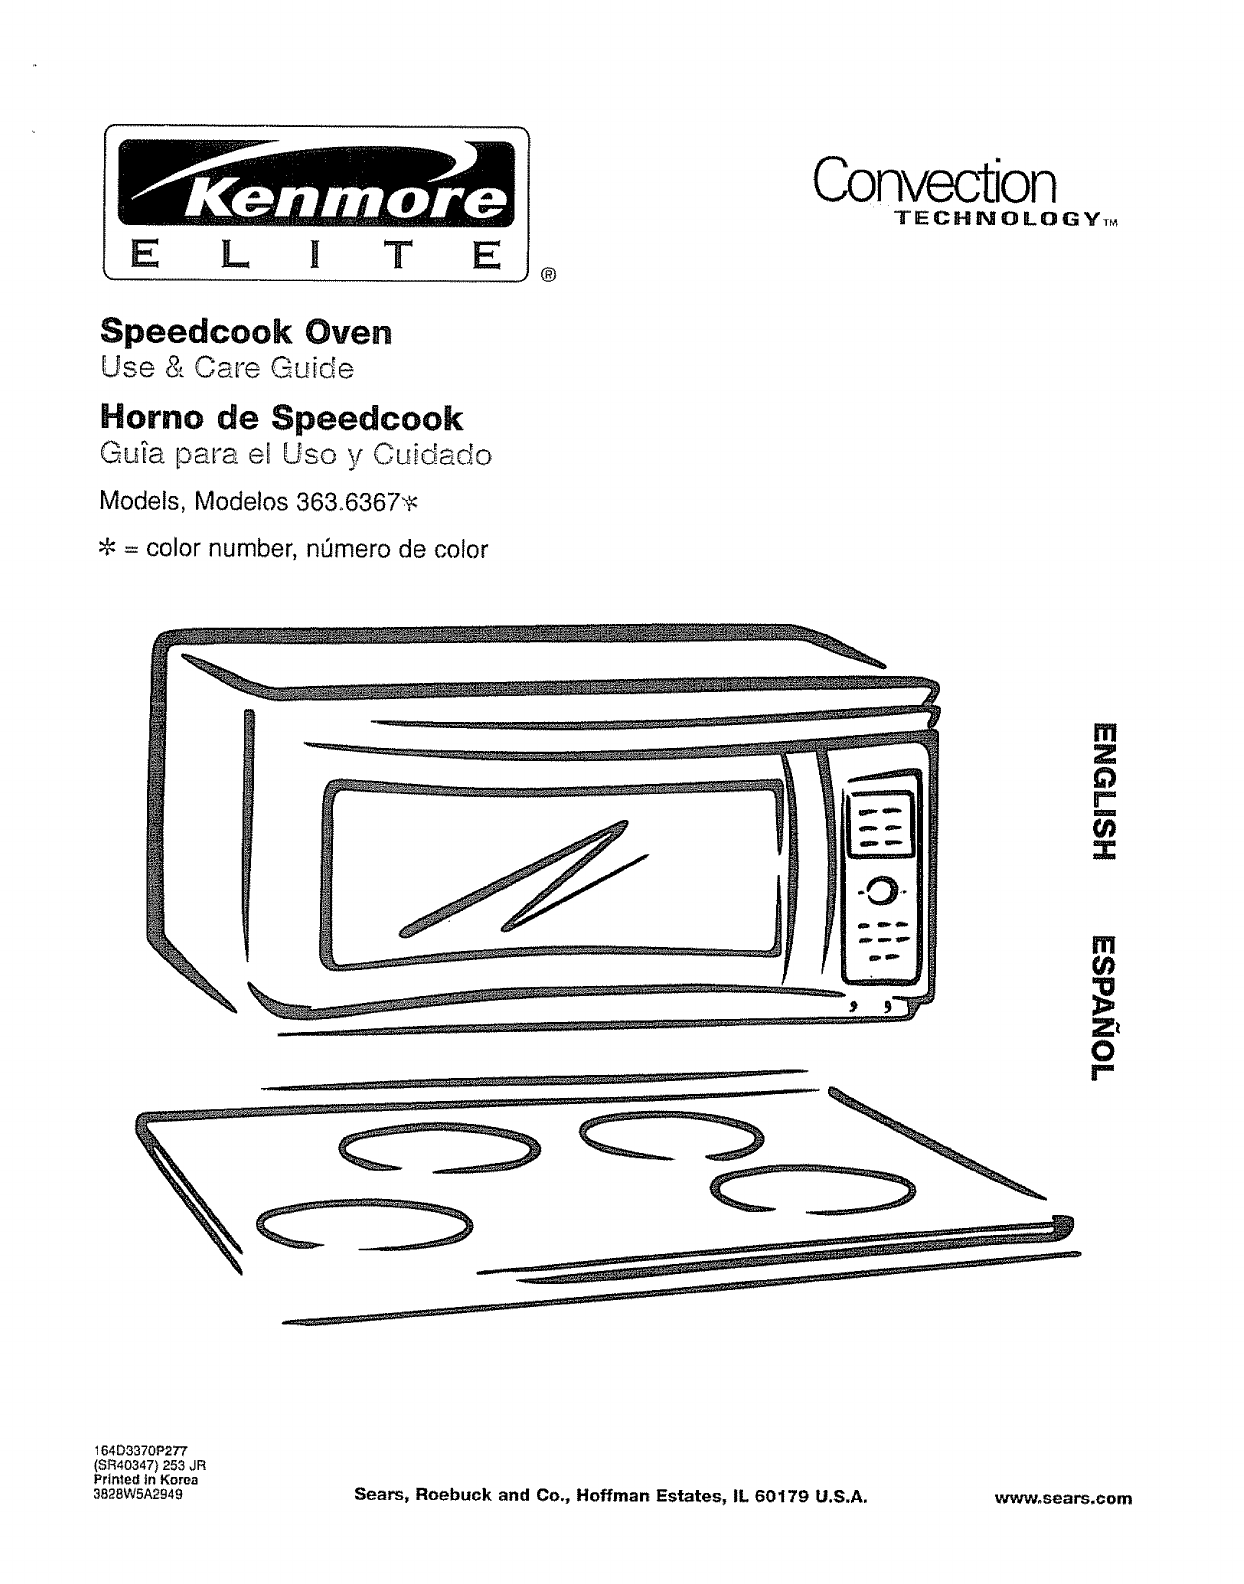 Kenmore Elite Microwave Hood Combination Troubleshooting